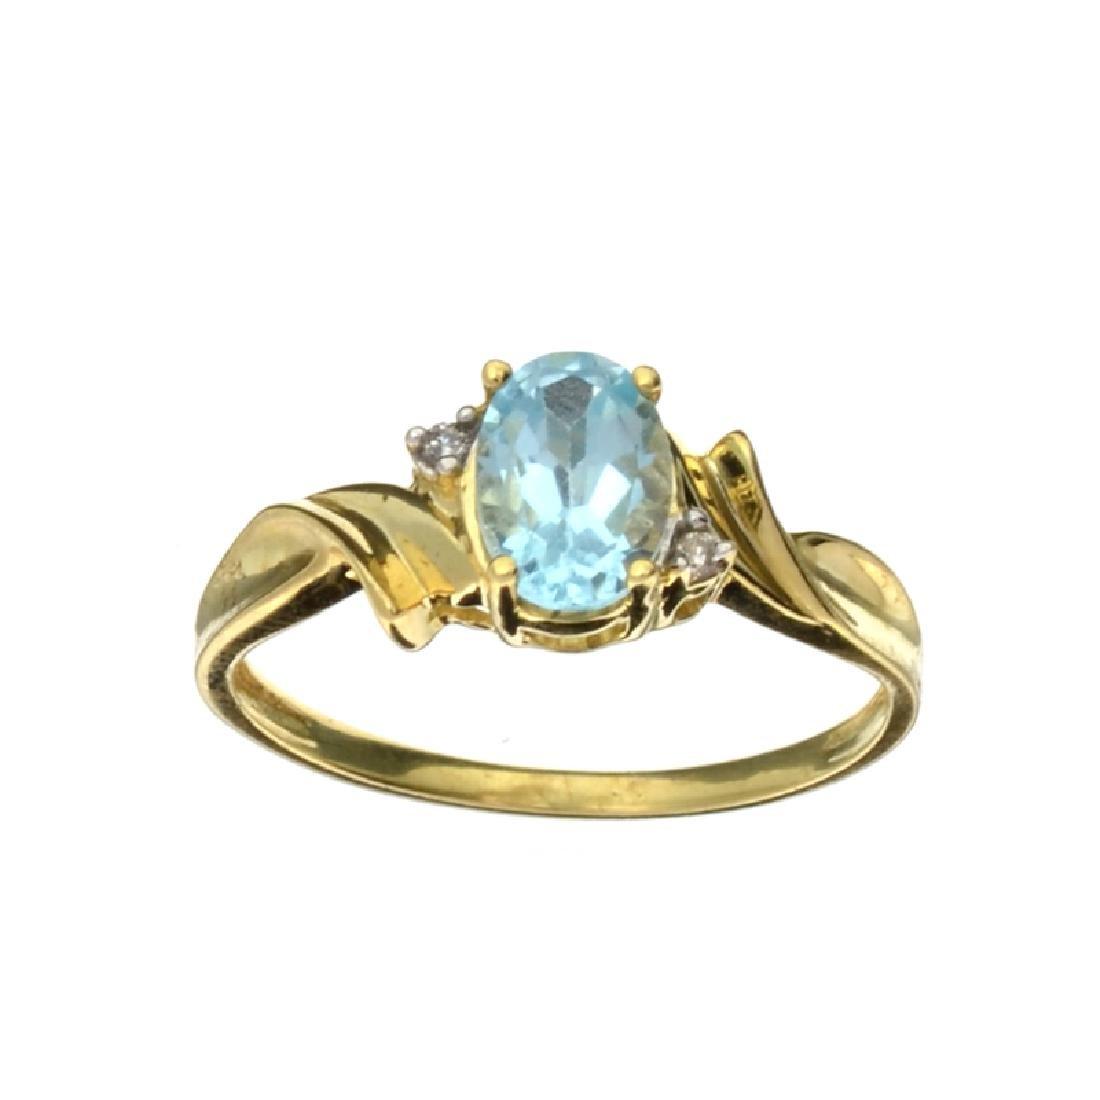 APP: 0.6k Fine Jewelry 10kt. Yellow/White Gold, 1.00CT